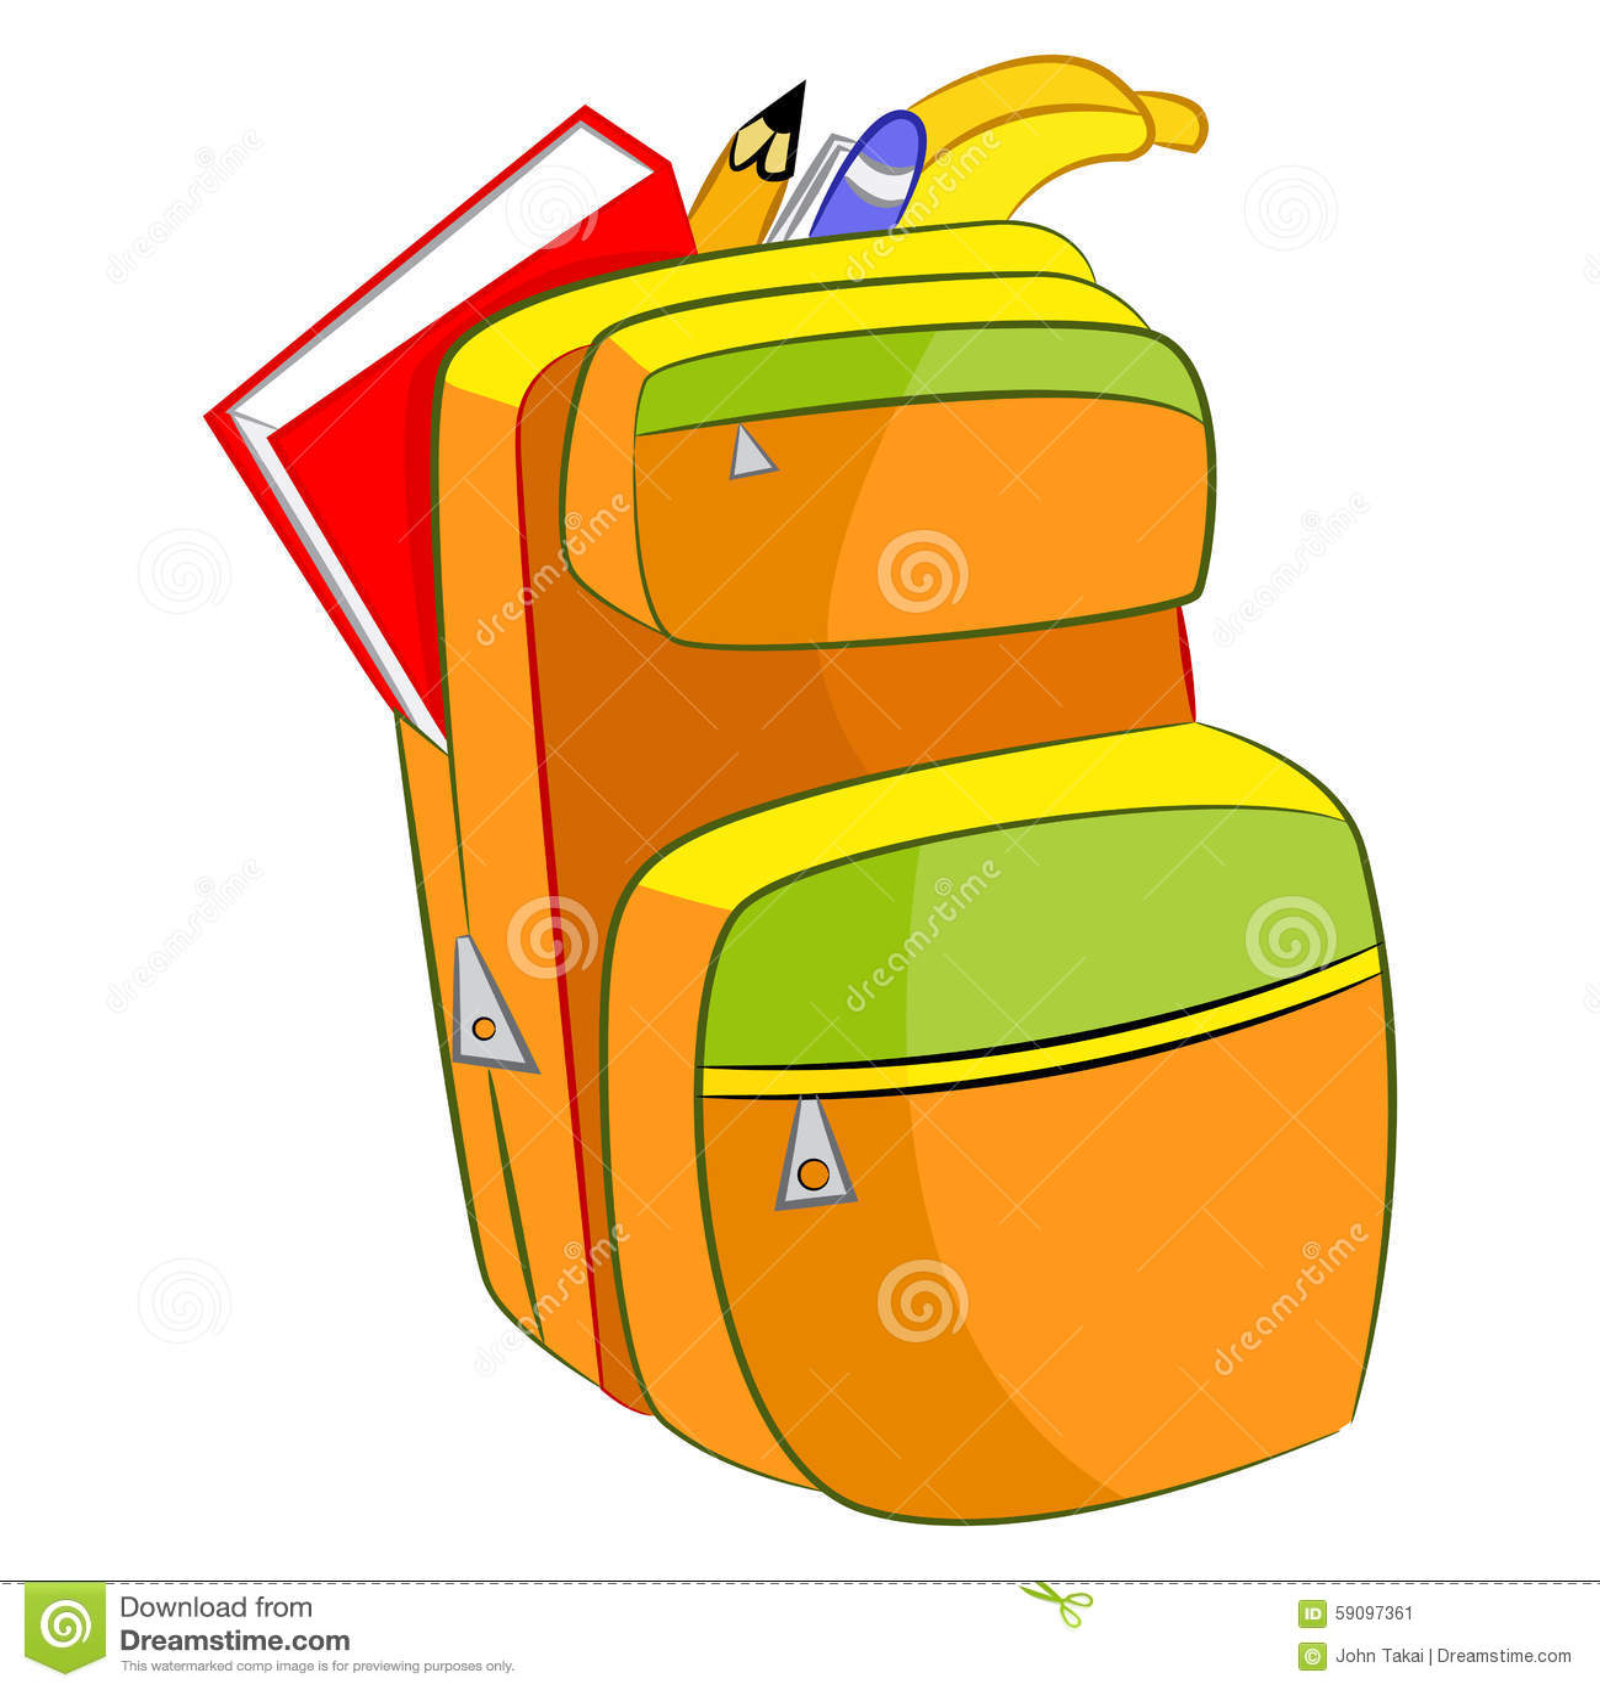 Cartoon Student Book Bag Stock Vector - Image: 59097361